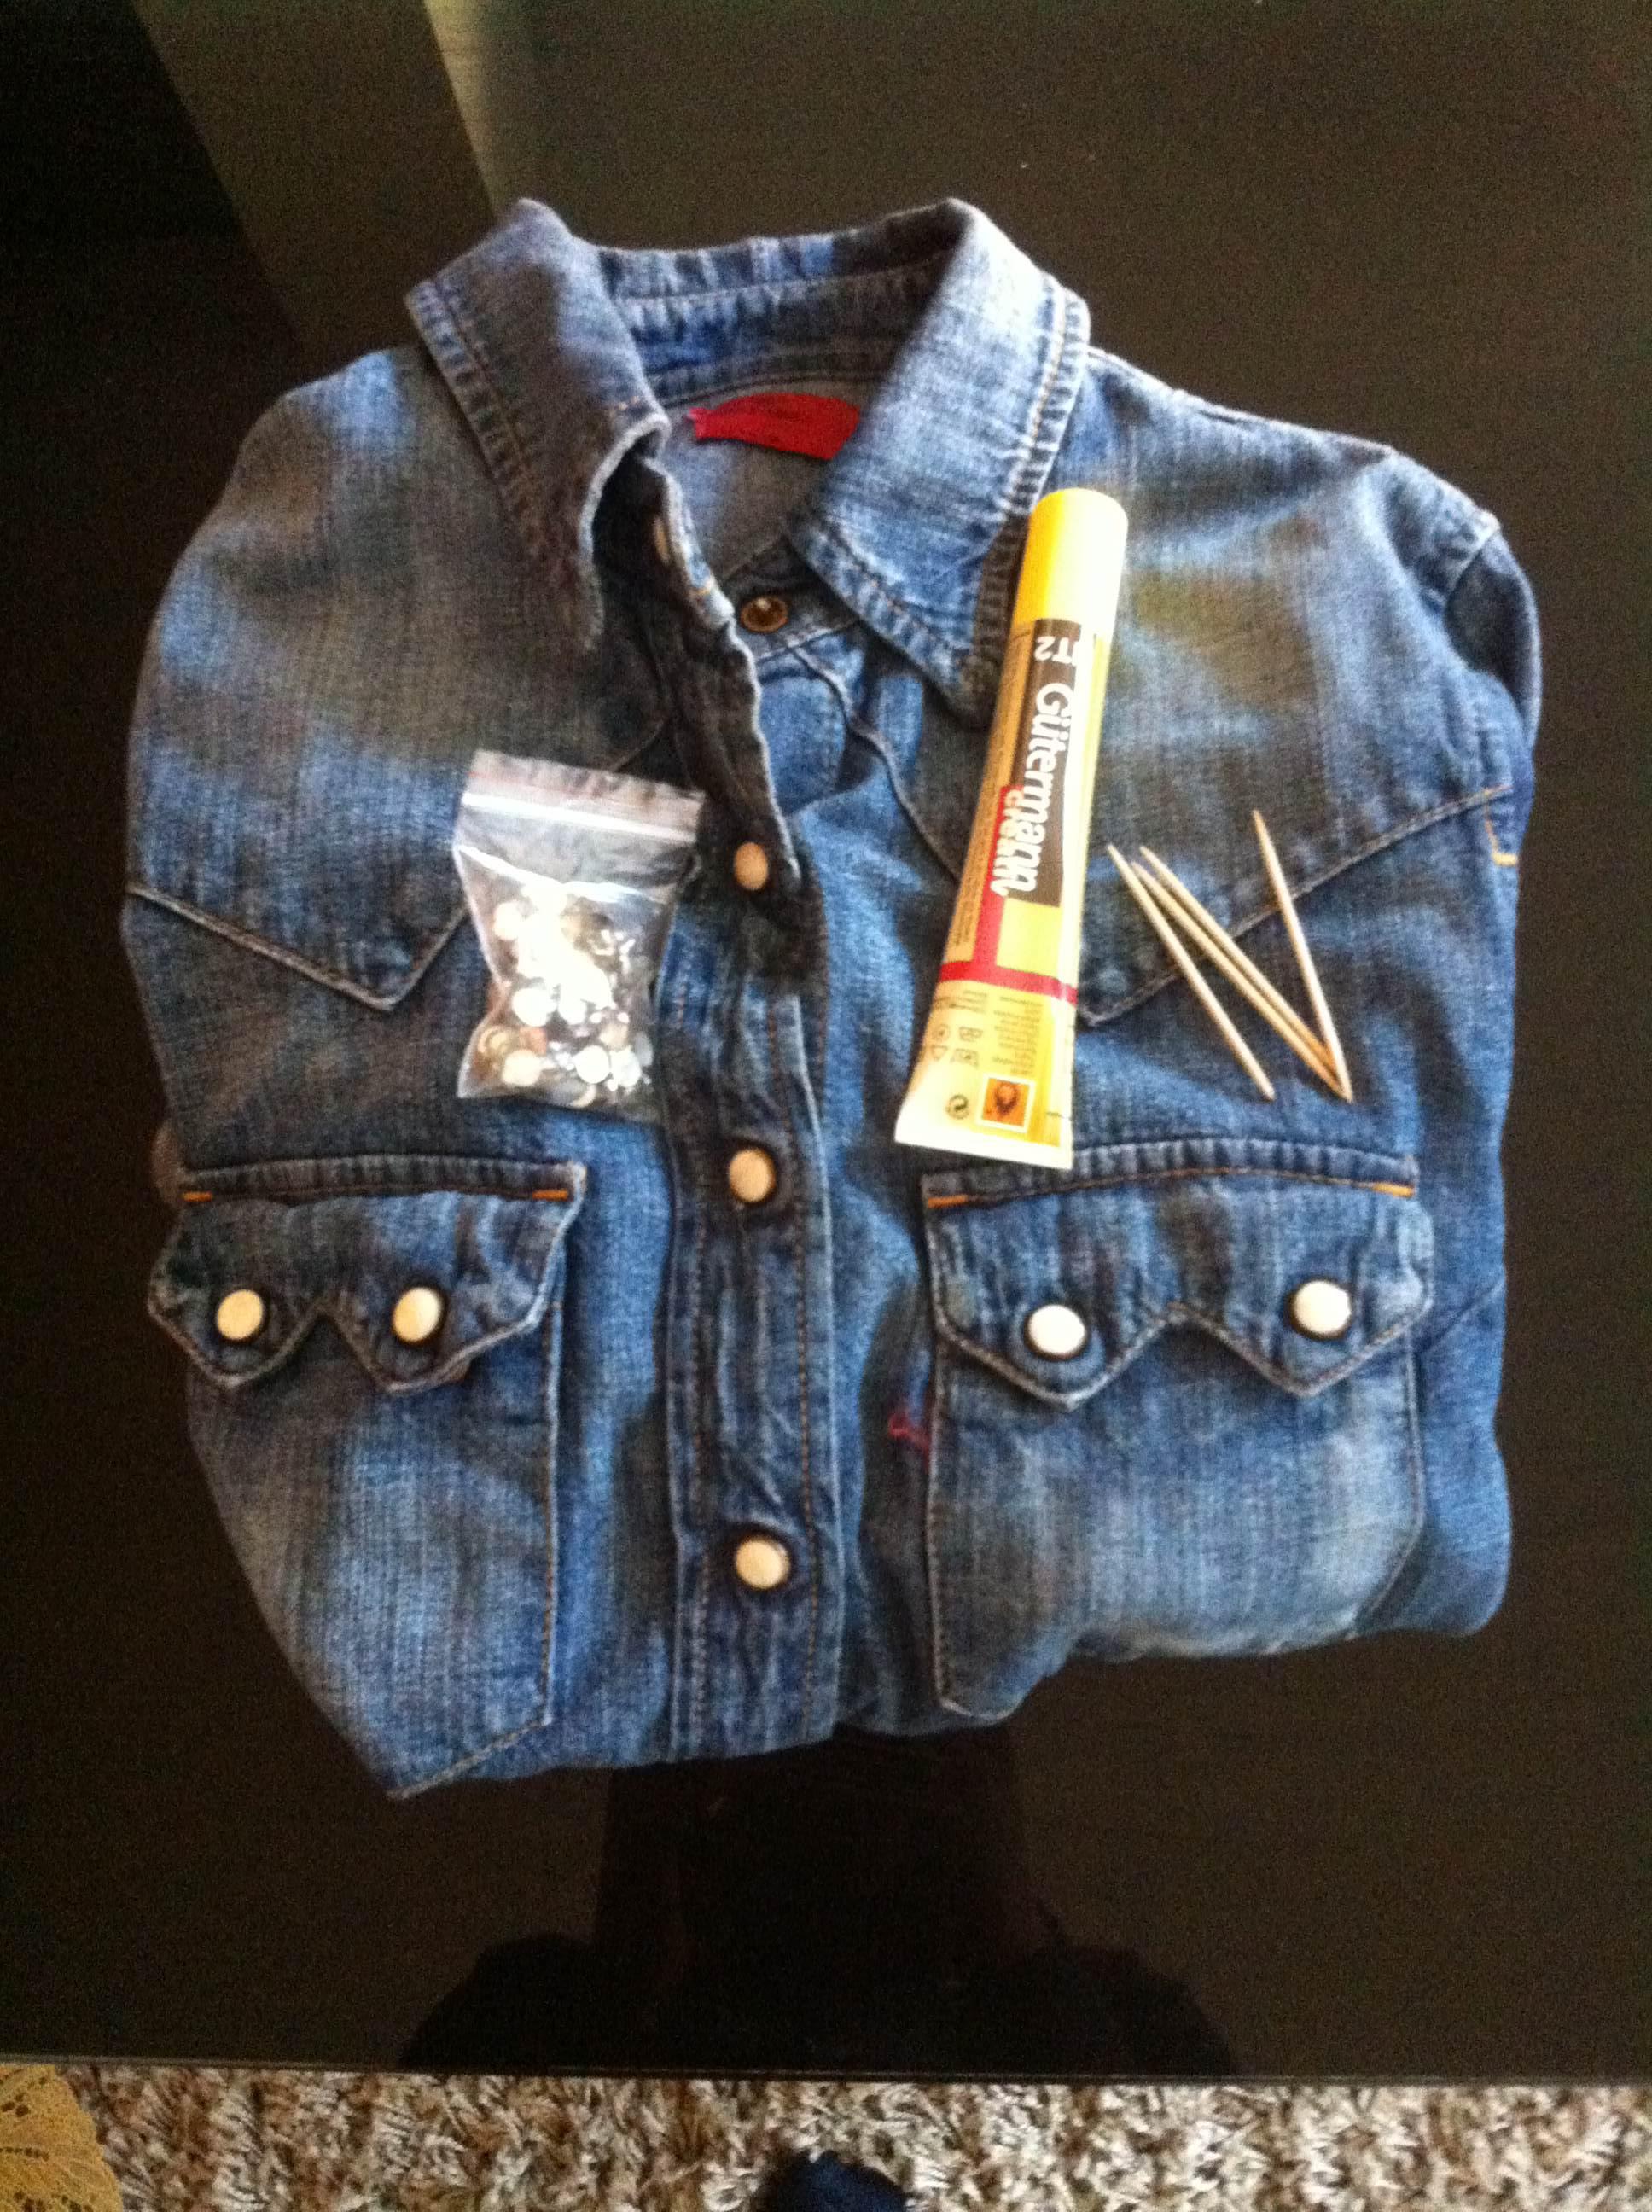 Fabulous Do it yourself : customiser sa chemise en jean - Deltreylicious CN33